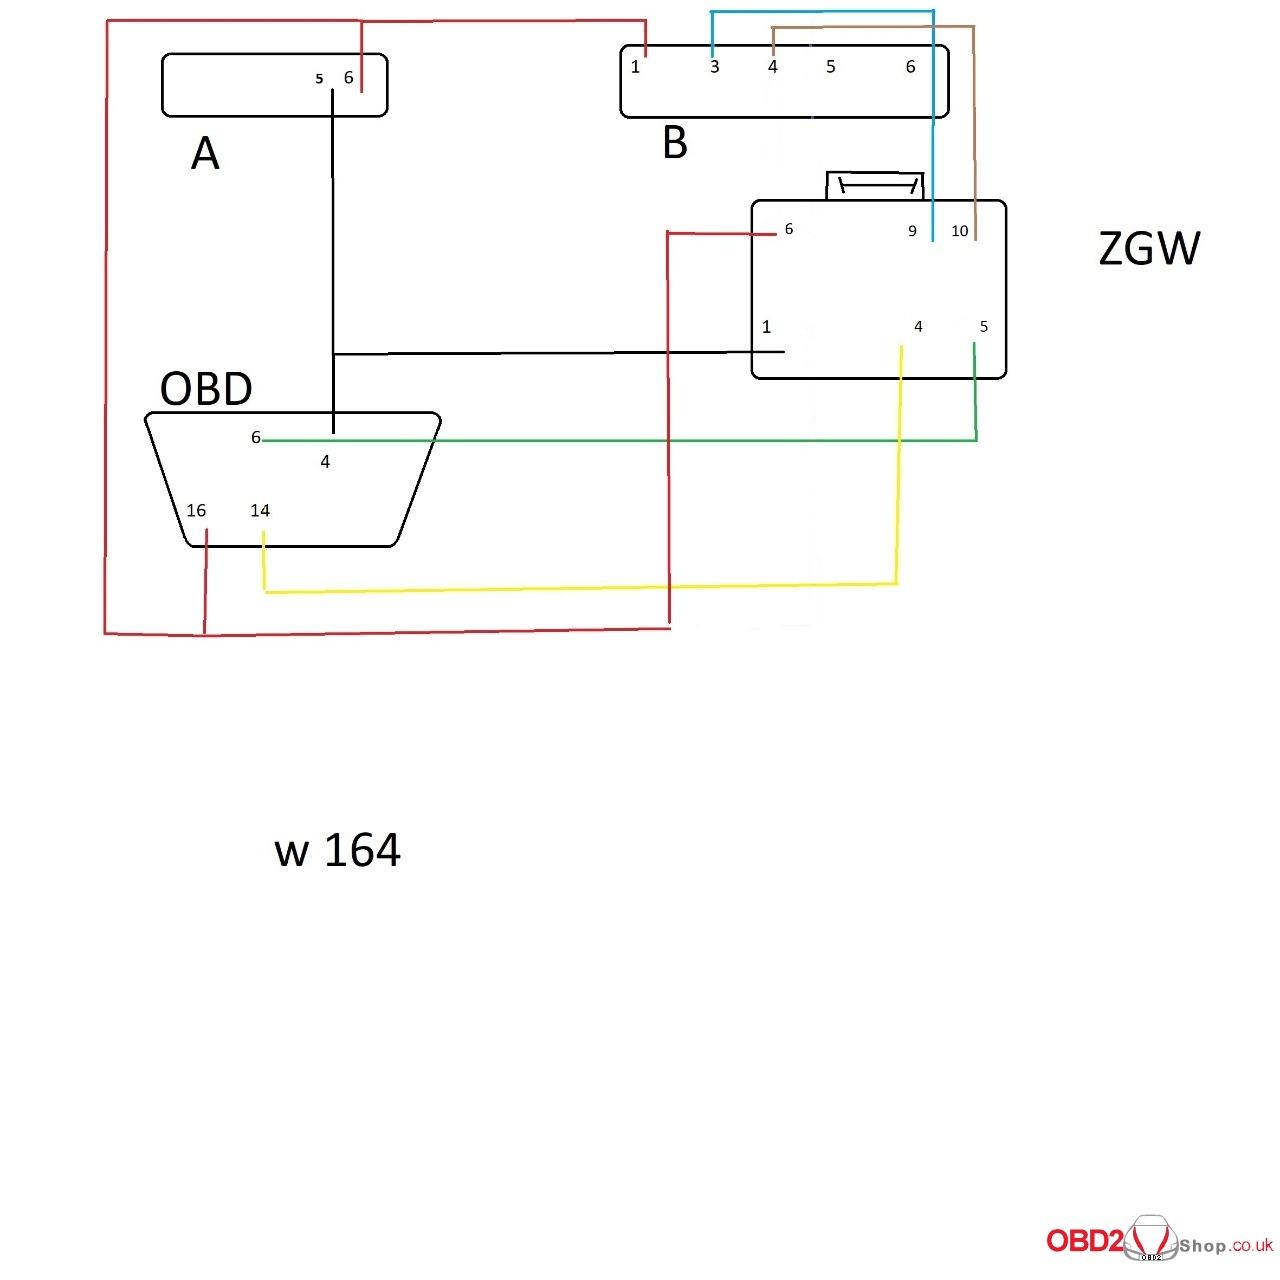 cgdi-mb-w164-wiring-diagram